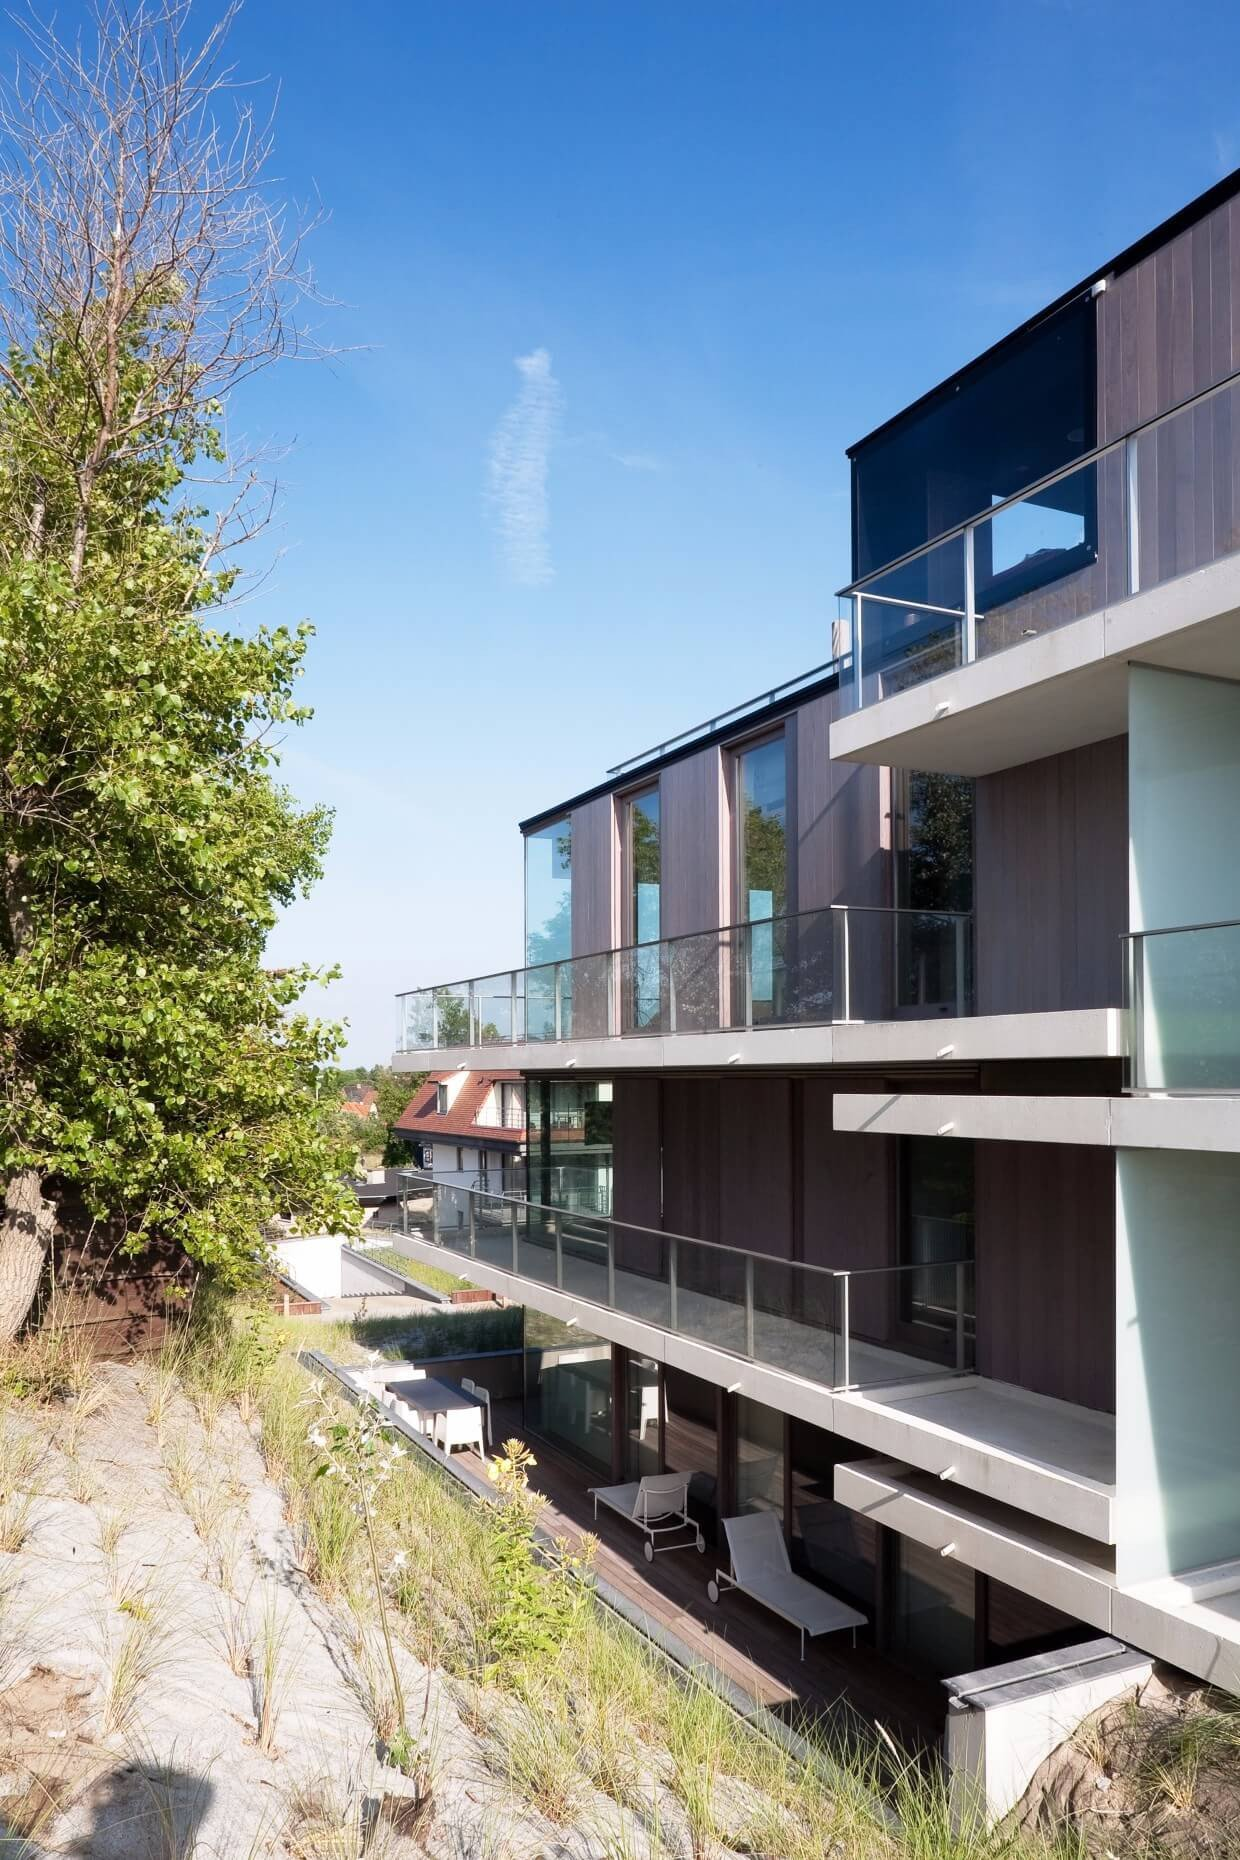 Rietveldprojects-Periscoop-appartement-design-architectuur-kust19